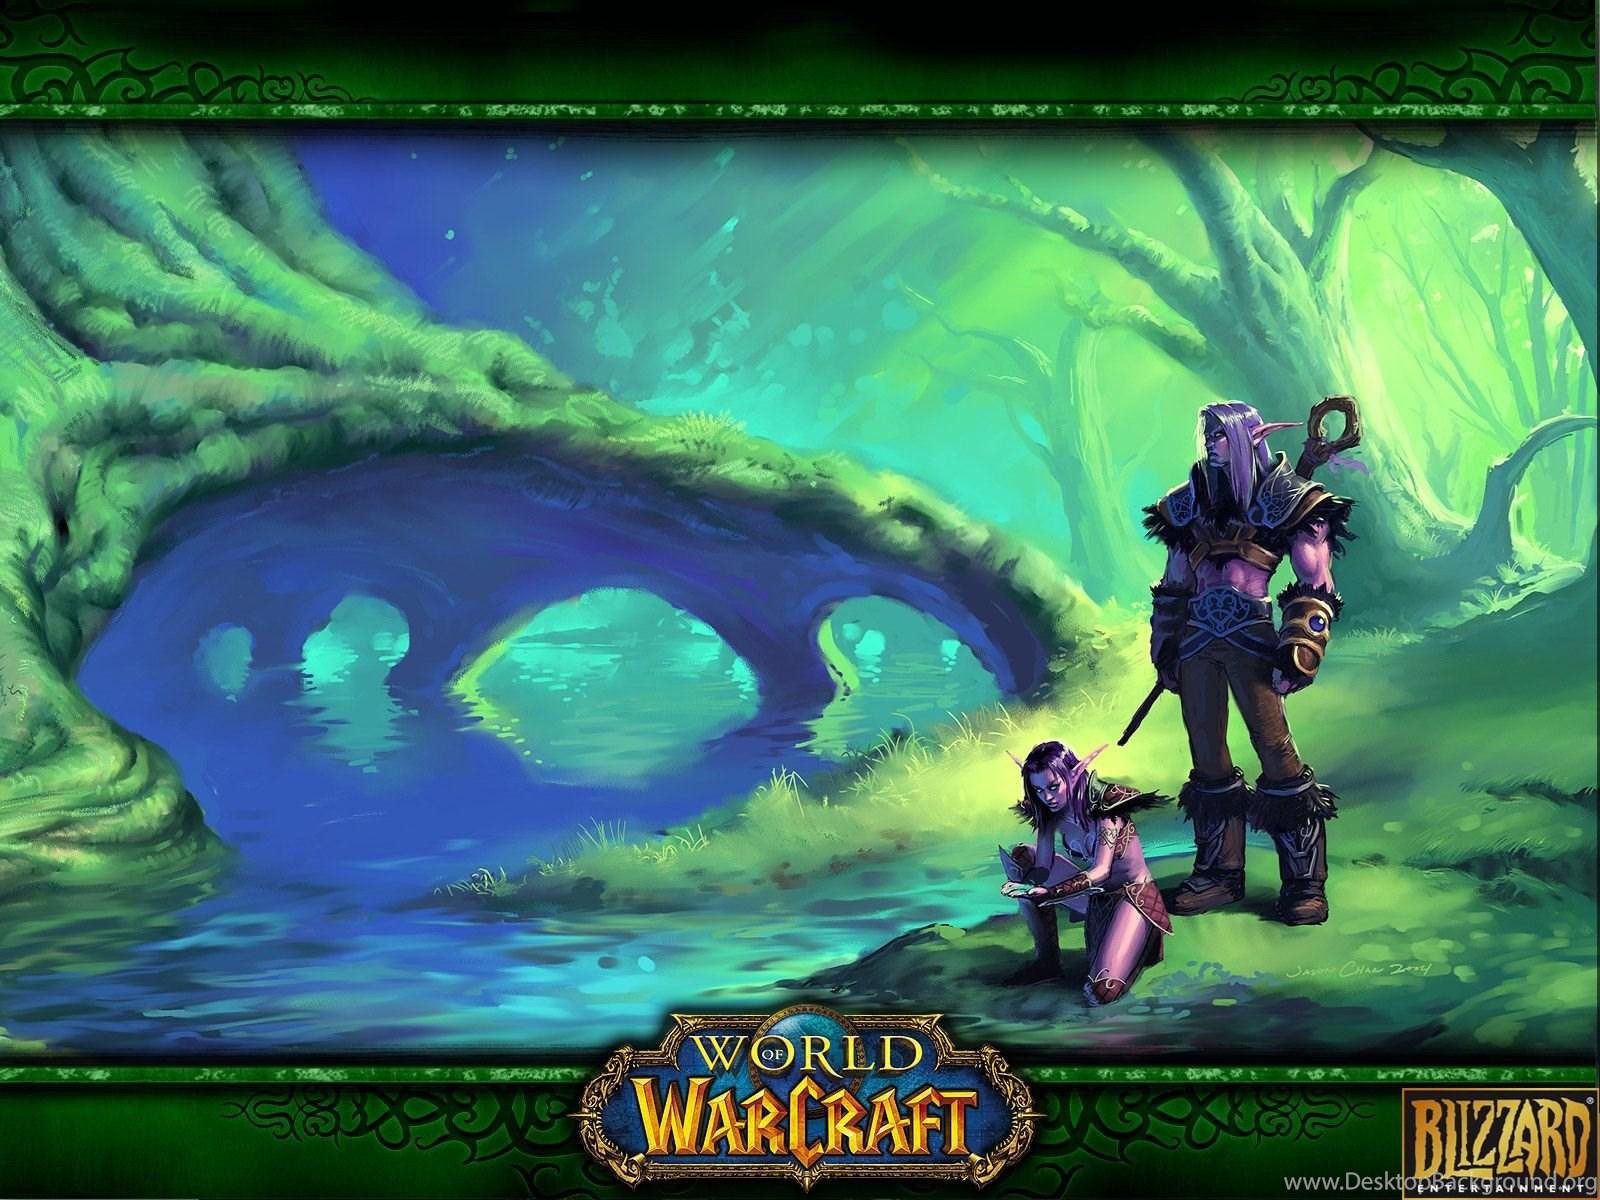 World Of Warcraft Night Elf Wallpapers 141166 Desktop Background